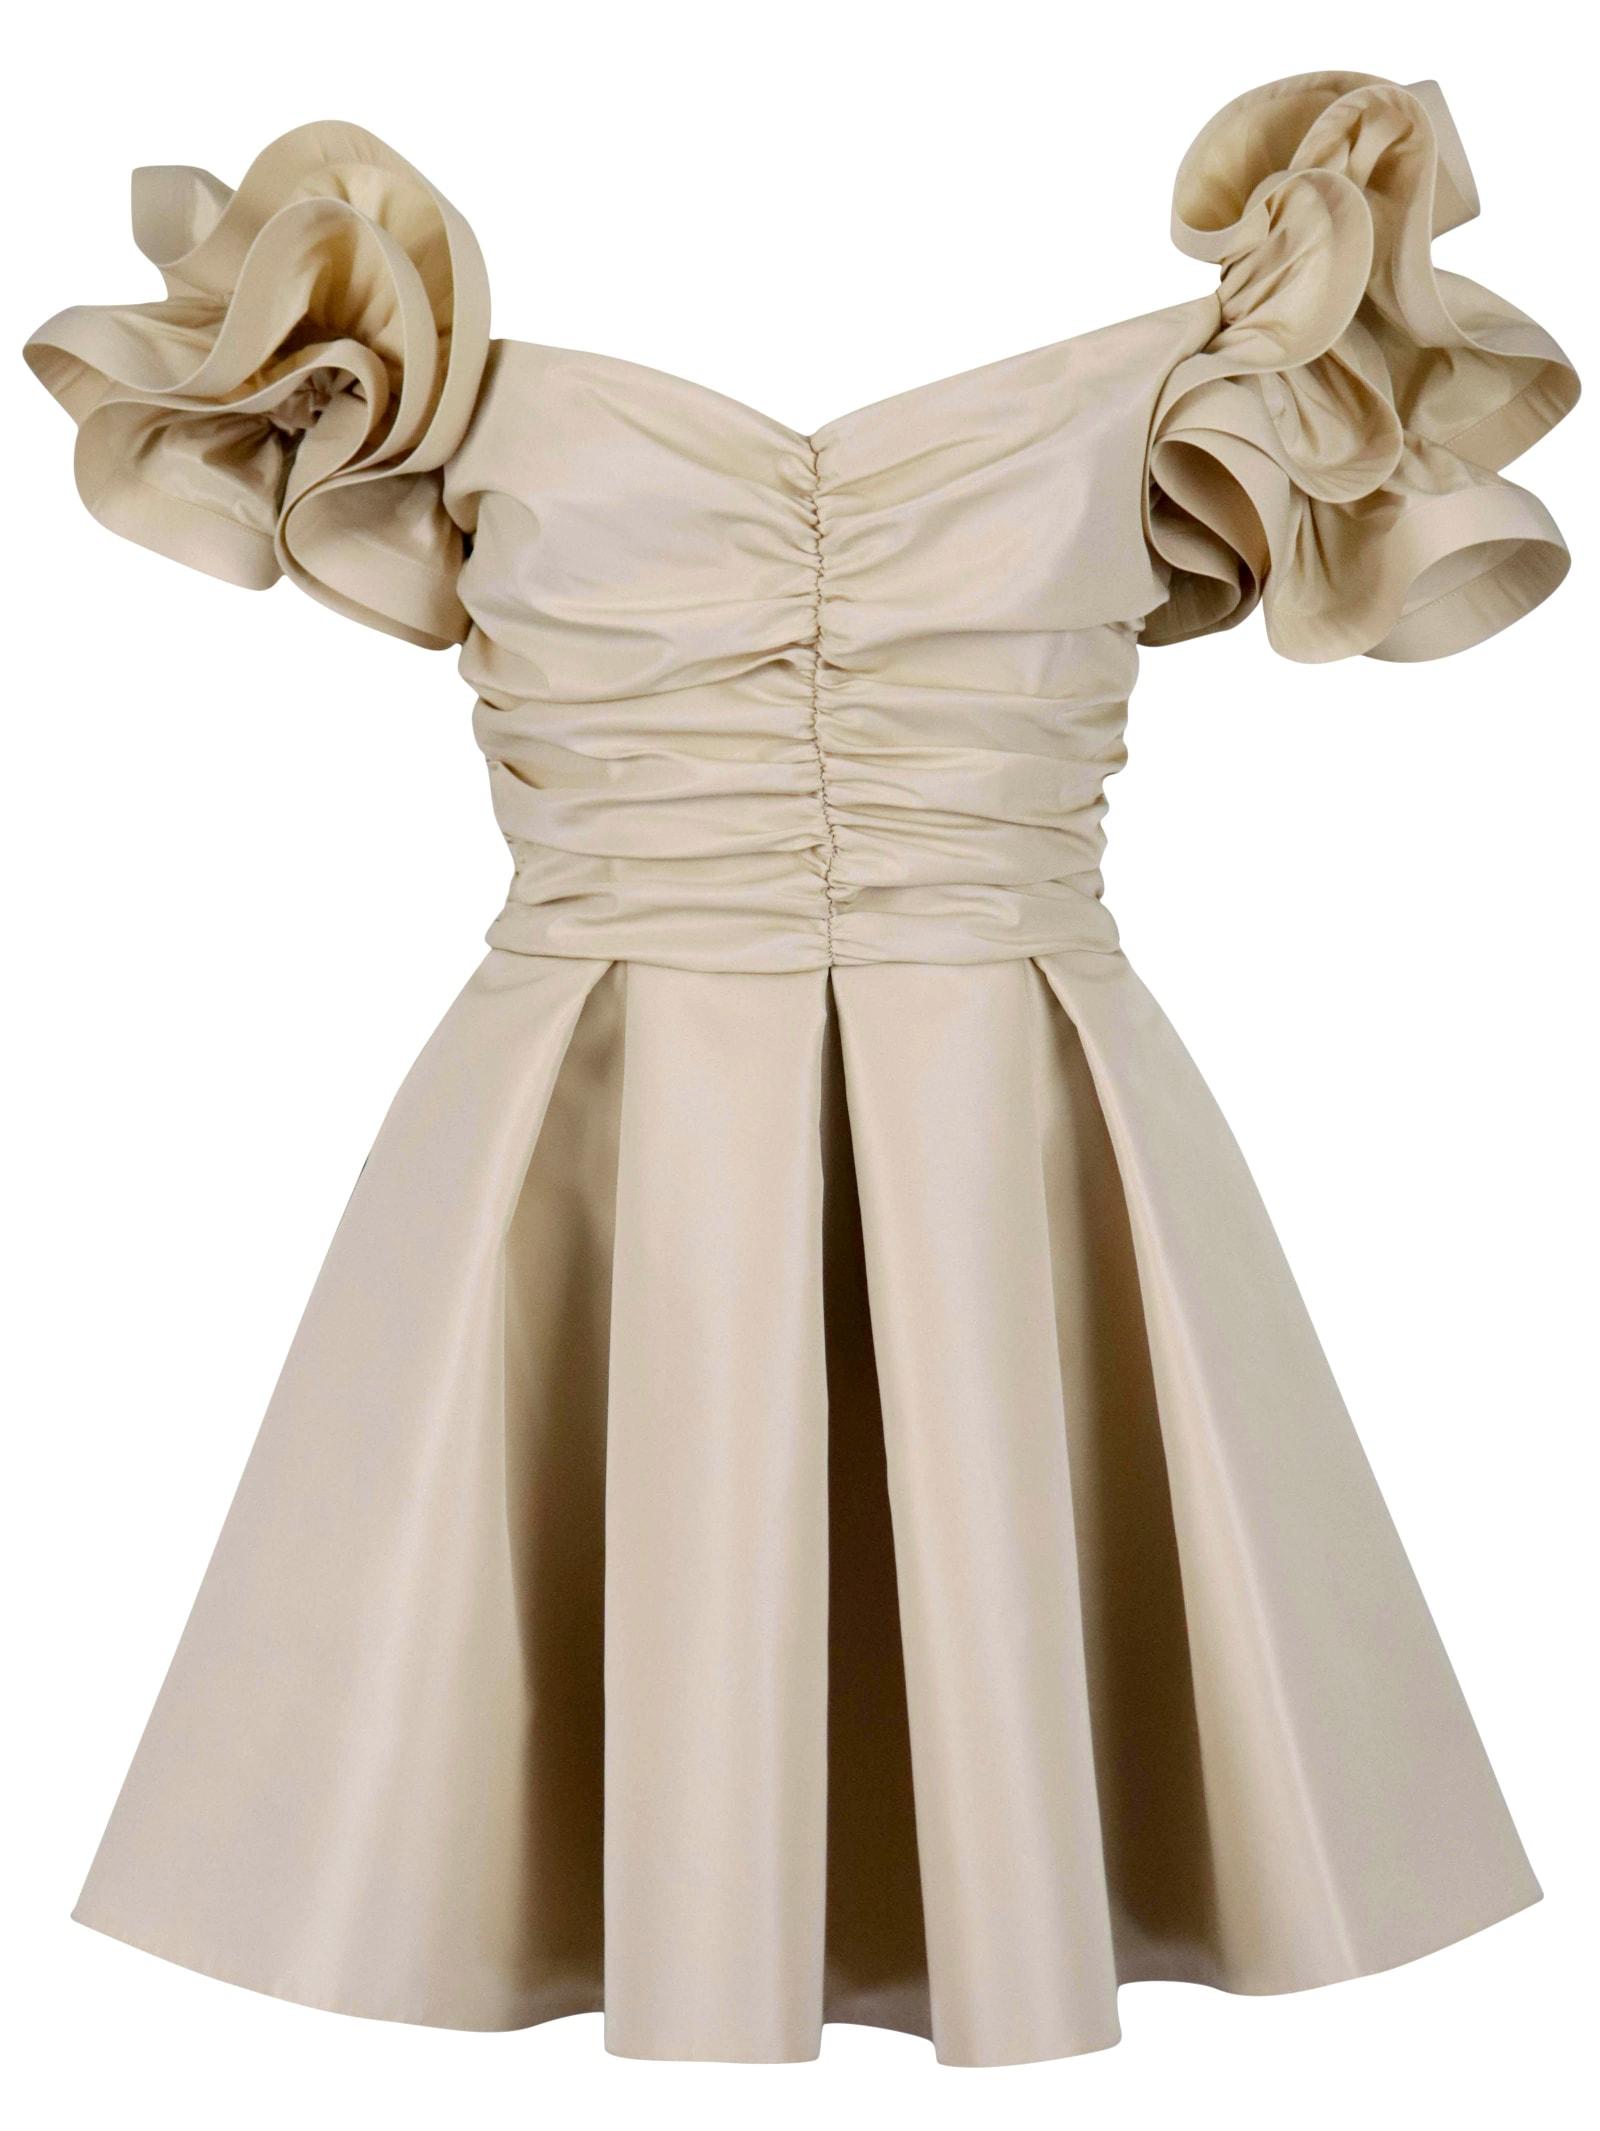 Elisabetta Franchi Rouches Dress Dress